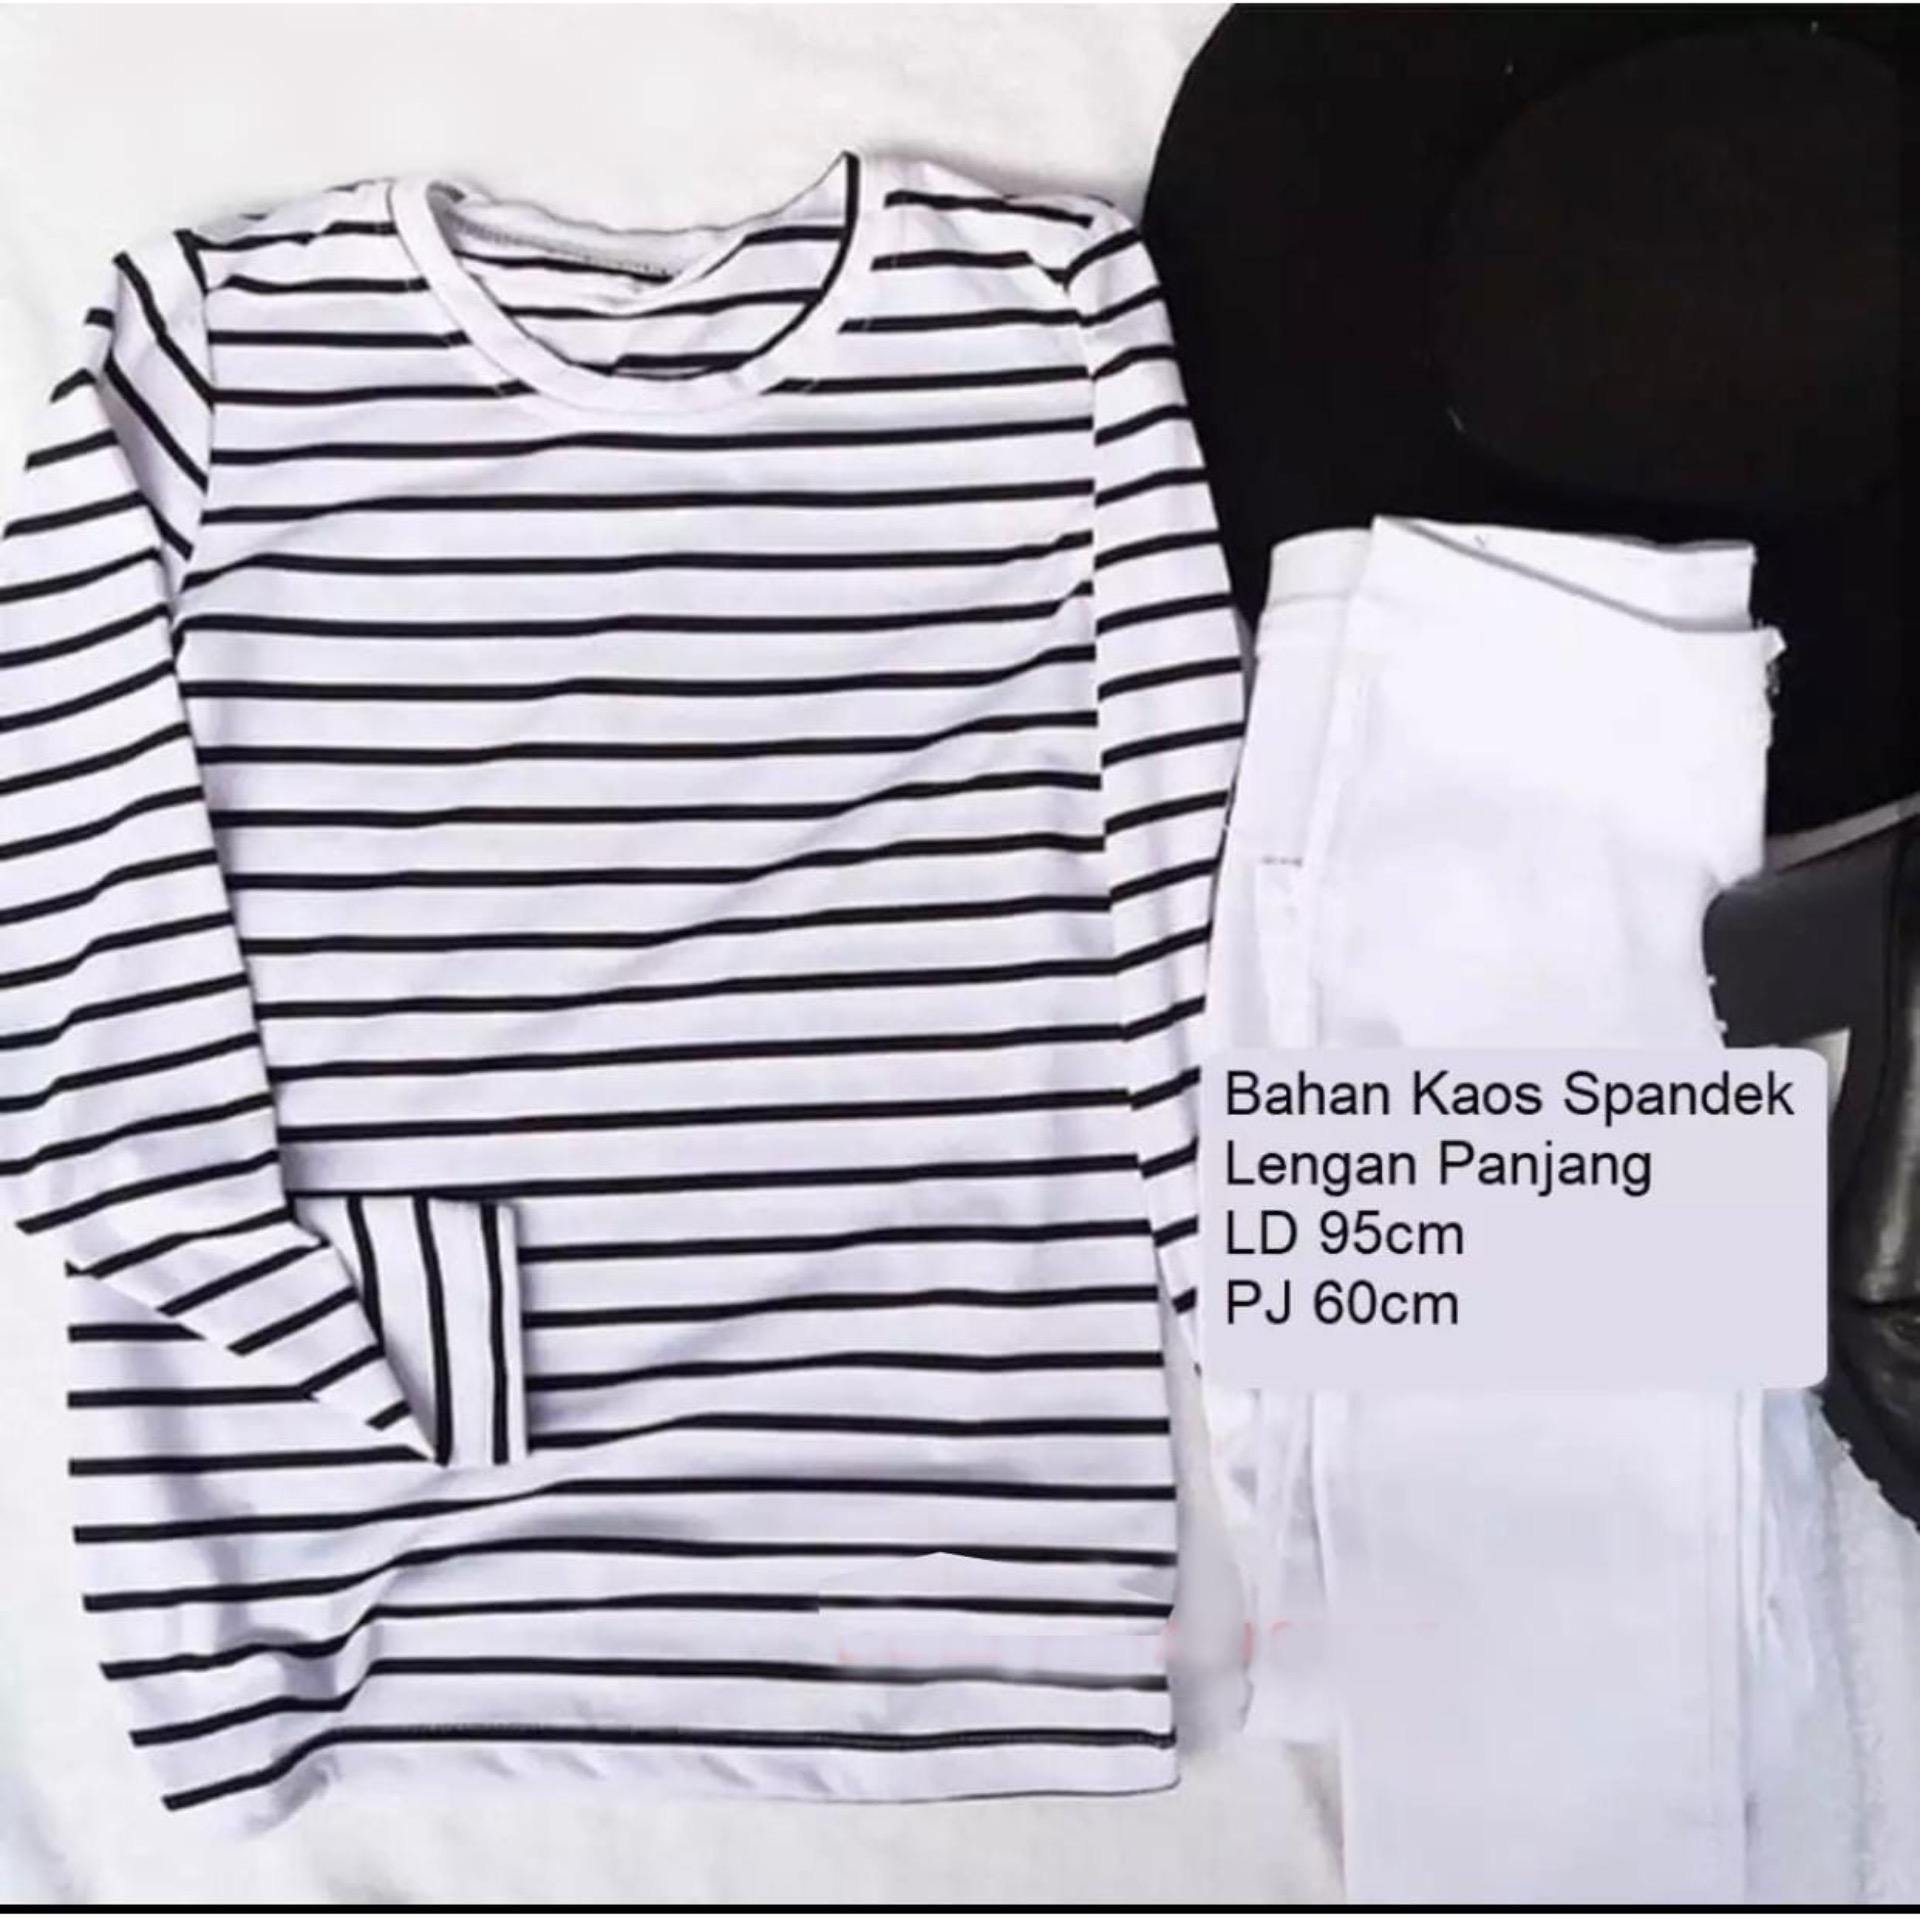 Blouse Tunik Wanita Setelan Baju Dan Celana Kucing Berkumis Original Kaos Lengan Panjang Garis Hitam Putih Atasan